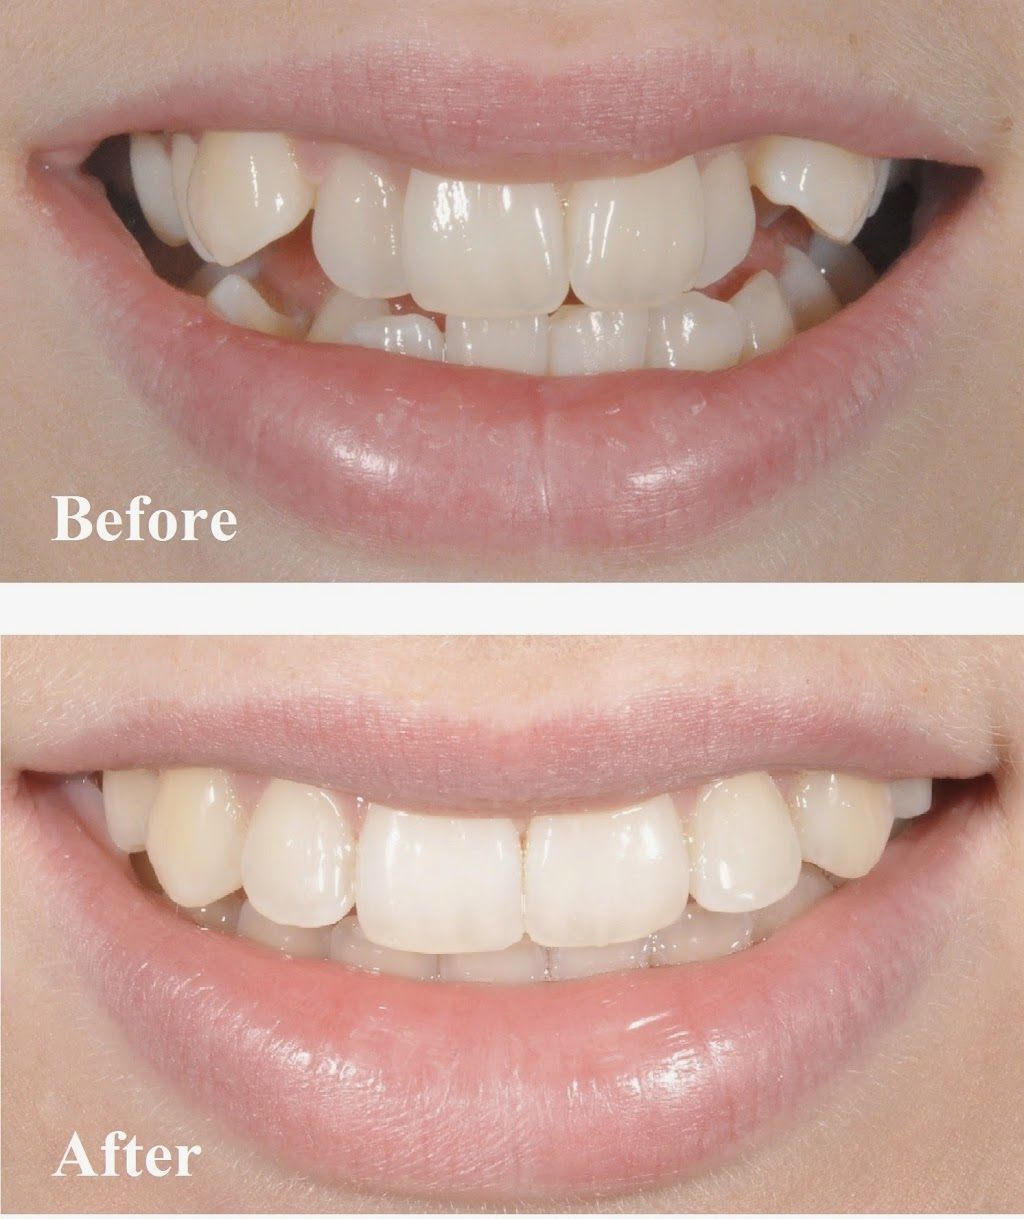 Kempsey Dental Centre   dentist   31 Smith St, Kempsey NSW 2440, Australia   0265631313 OR +61 2 6563 1313